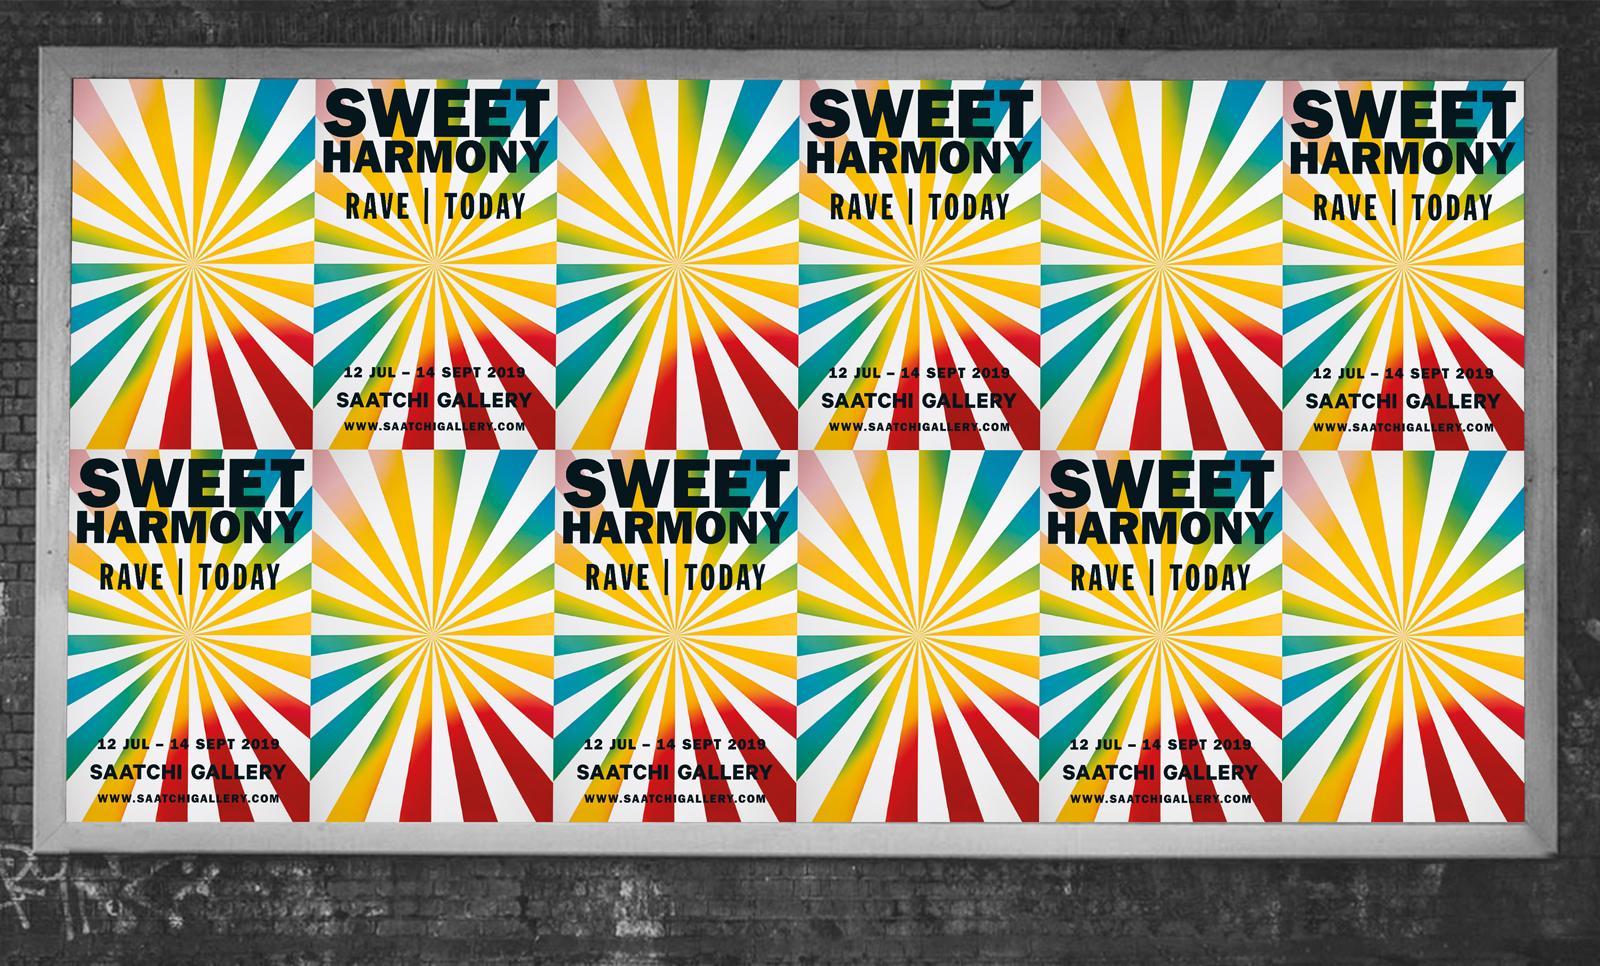 Sweet-Harmony-Saatchi-Gallery-Rave-Today-48Sheet-Pavement-Licker.jpg